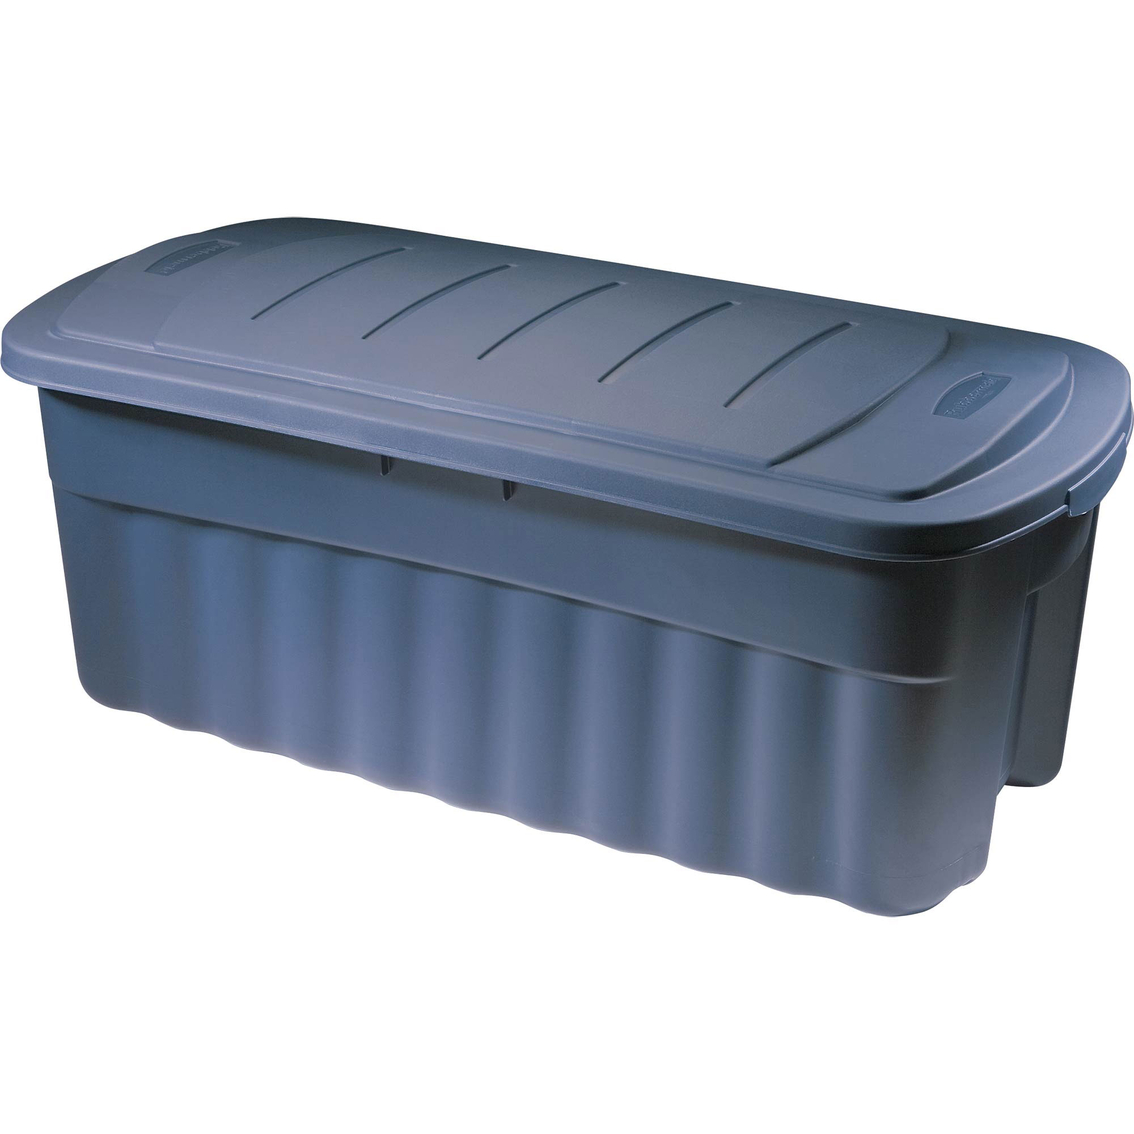 1191  sc 1 st  ShopMyExchange.com & Rubbermaid Roughneck Jumbo Storage Box 50 Gal. | Storage Systems ...